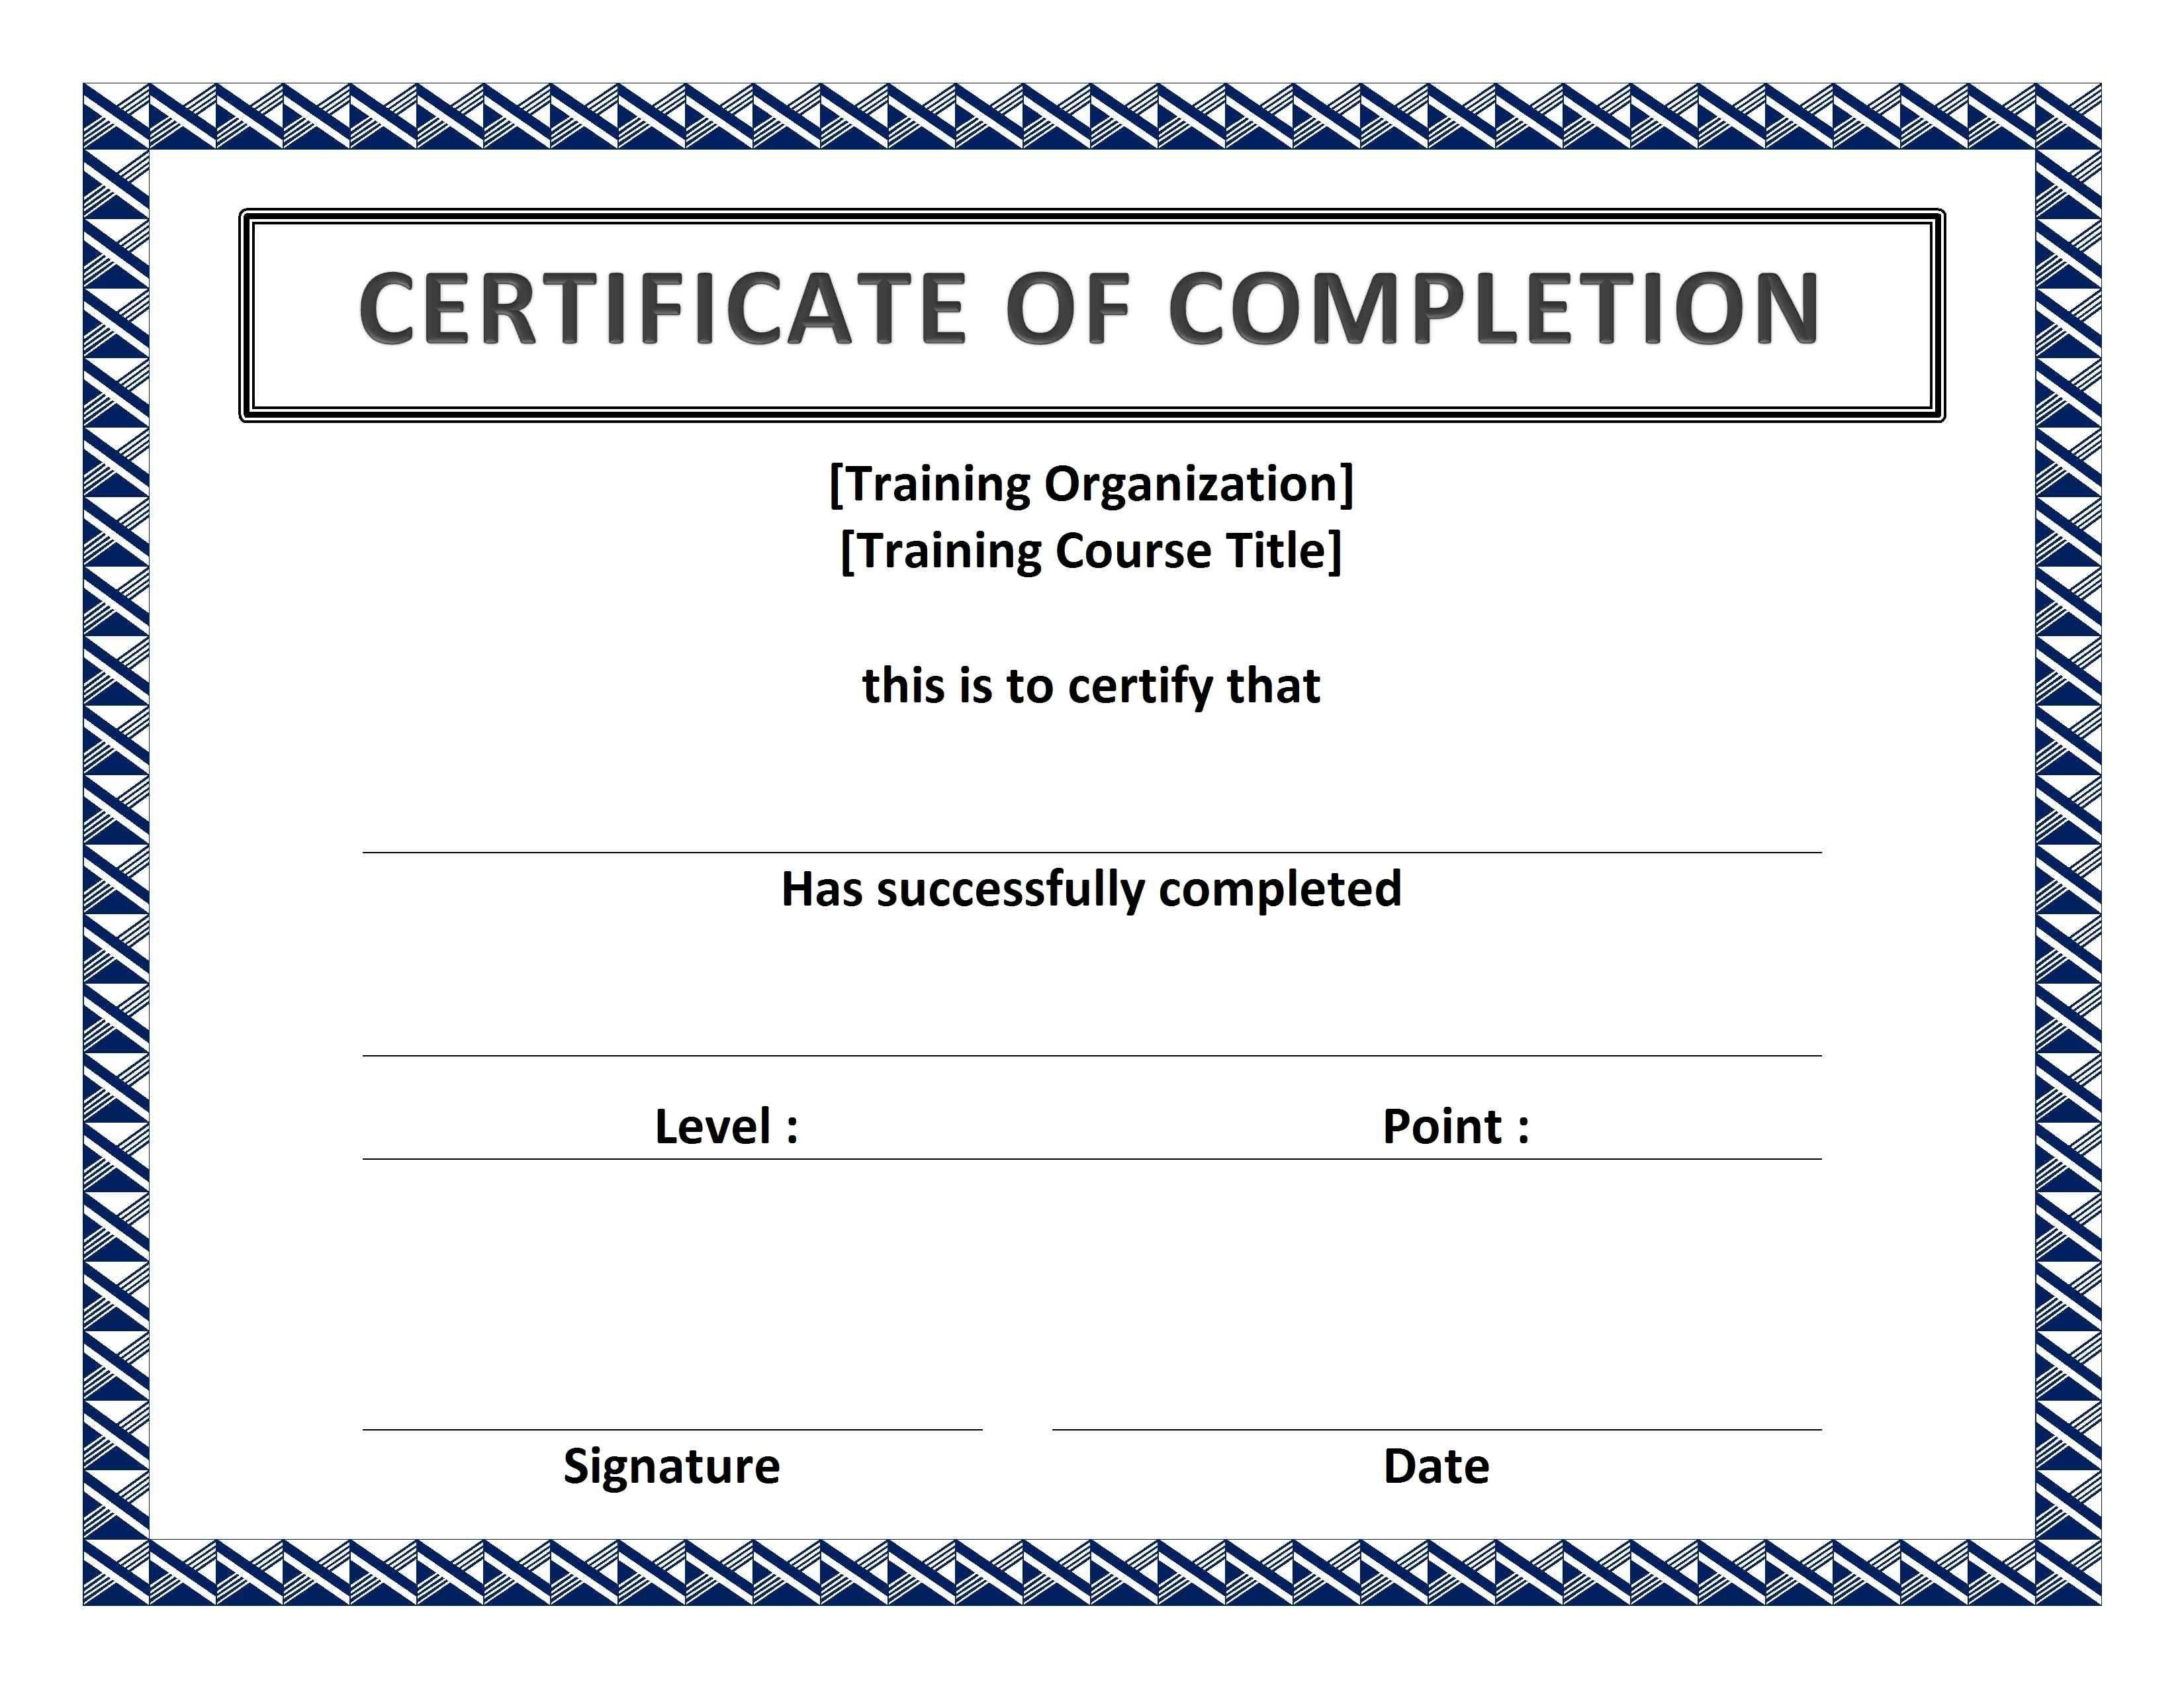 Free Printable Certificate To Printing Certificate Of Completion Template Free Certificate Templates Certificate Of Completion Certificate of completion free template